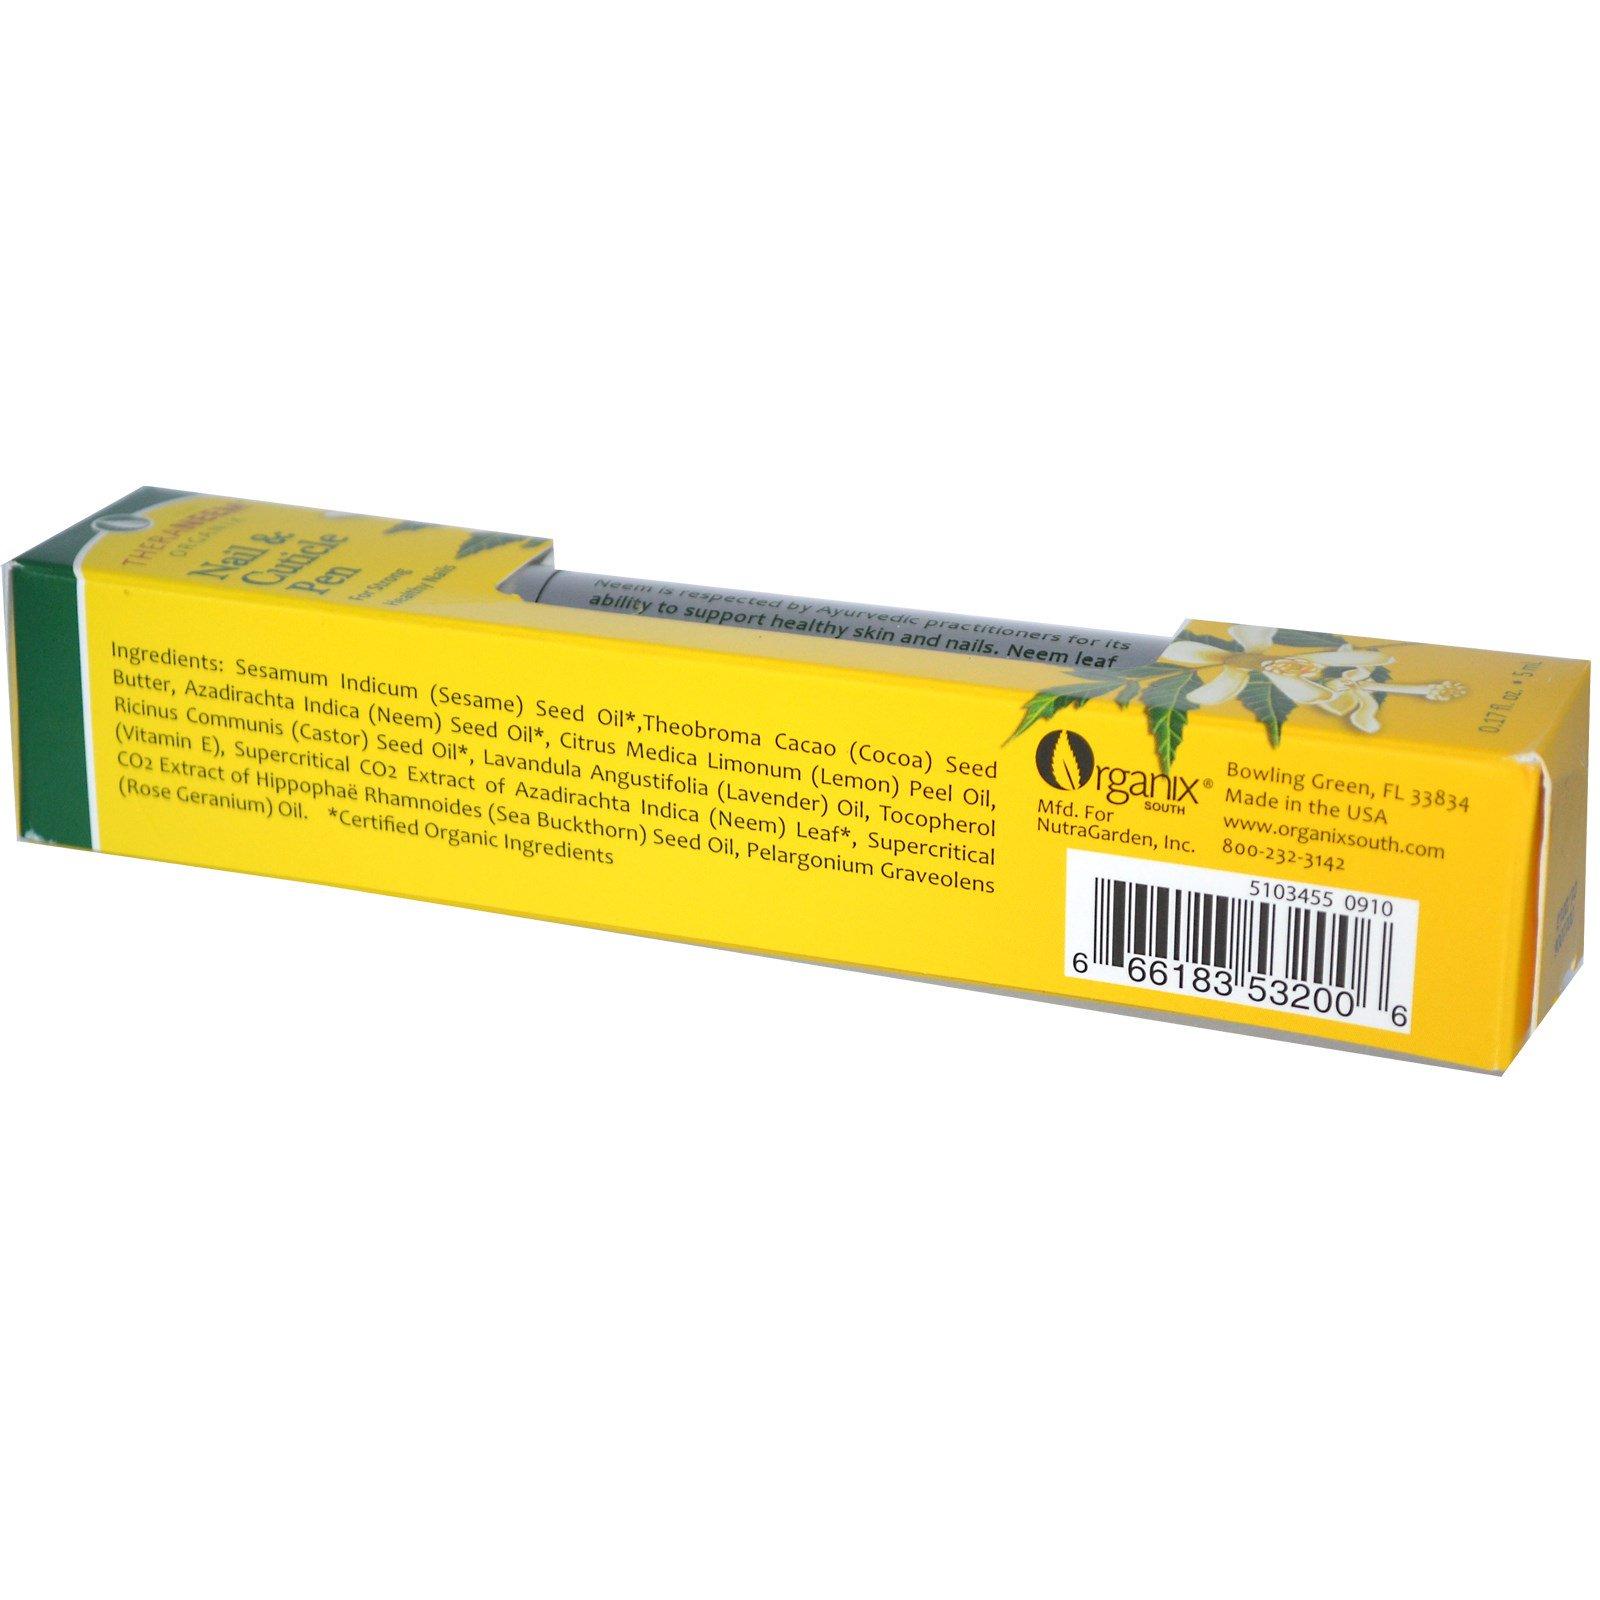 Organix South, TheraNeem Organix, карандаш для ногтей и кутикулы, 0,17 жидких унций (5 мл)